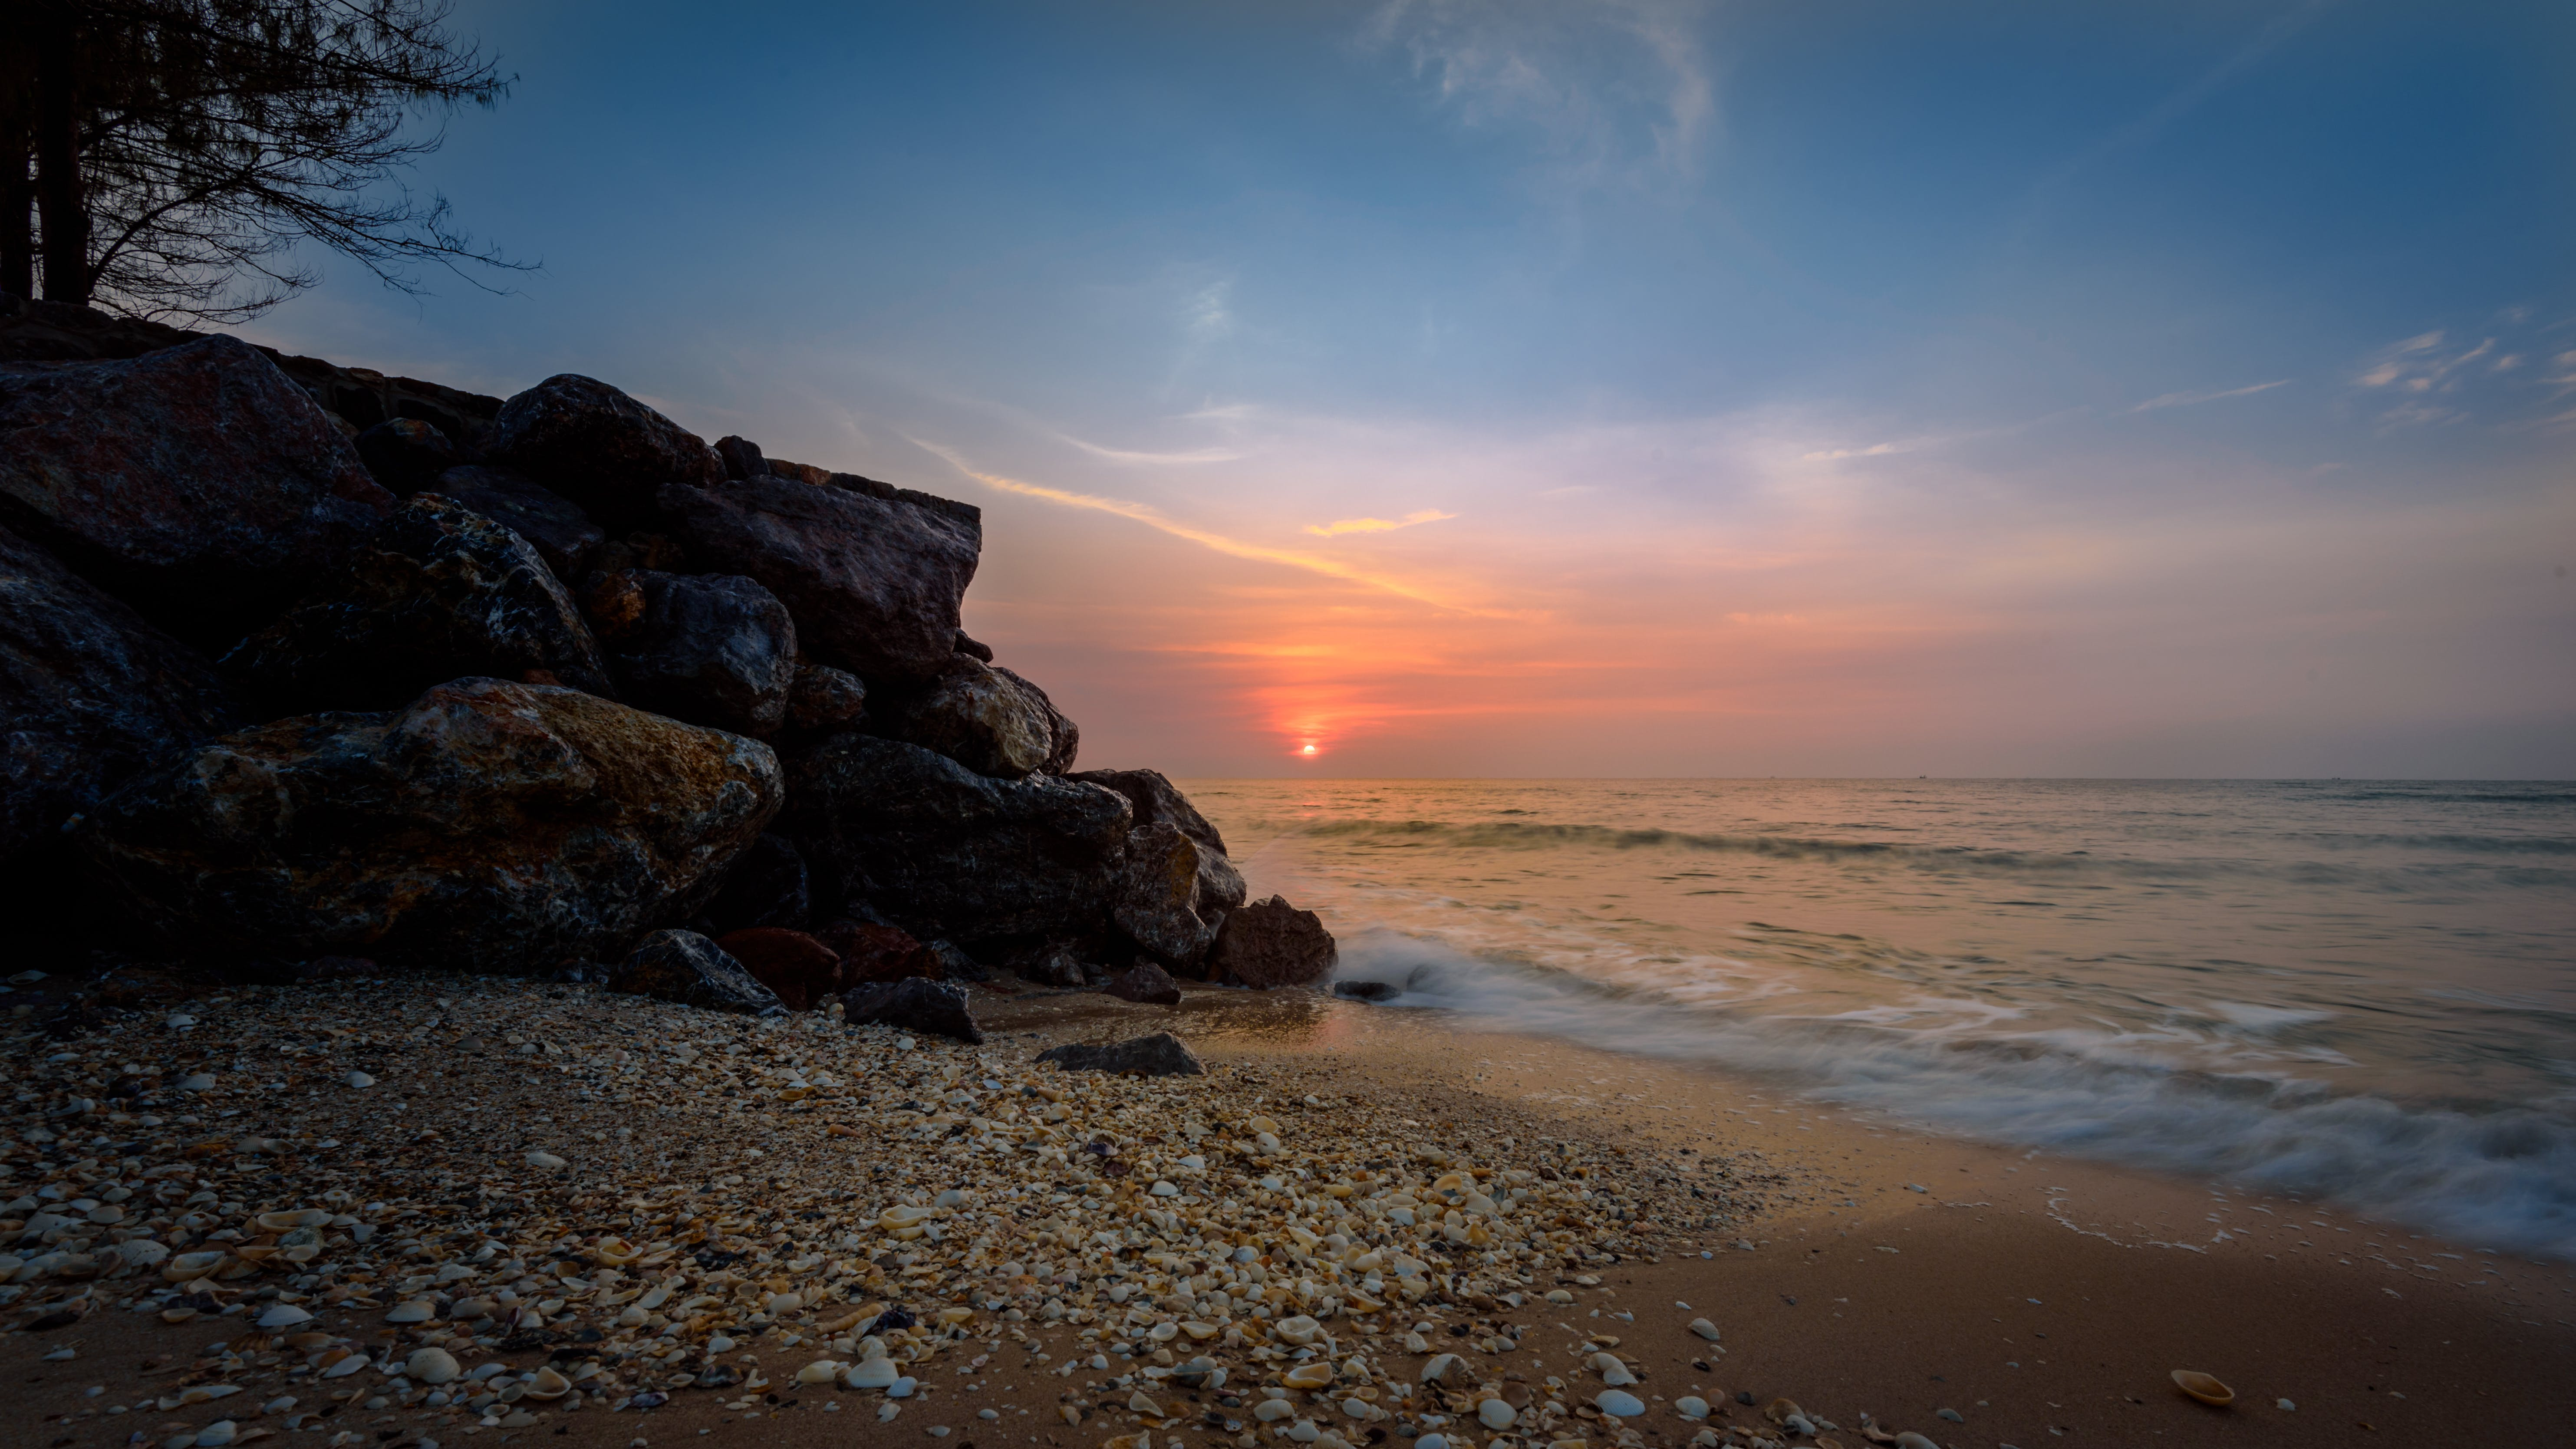 Seashore during Sunset Photography